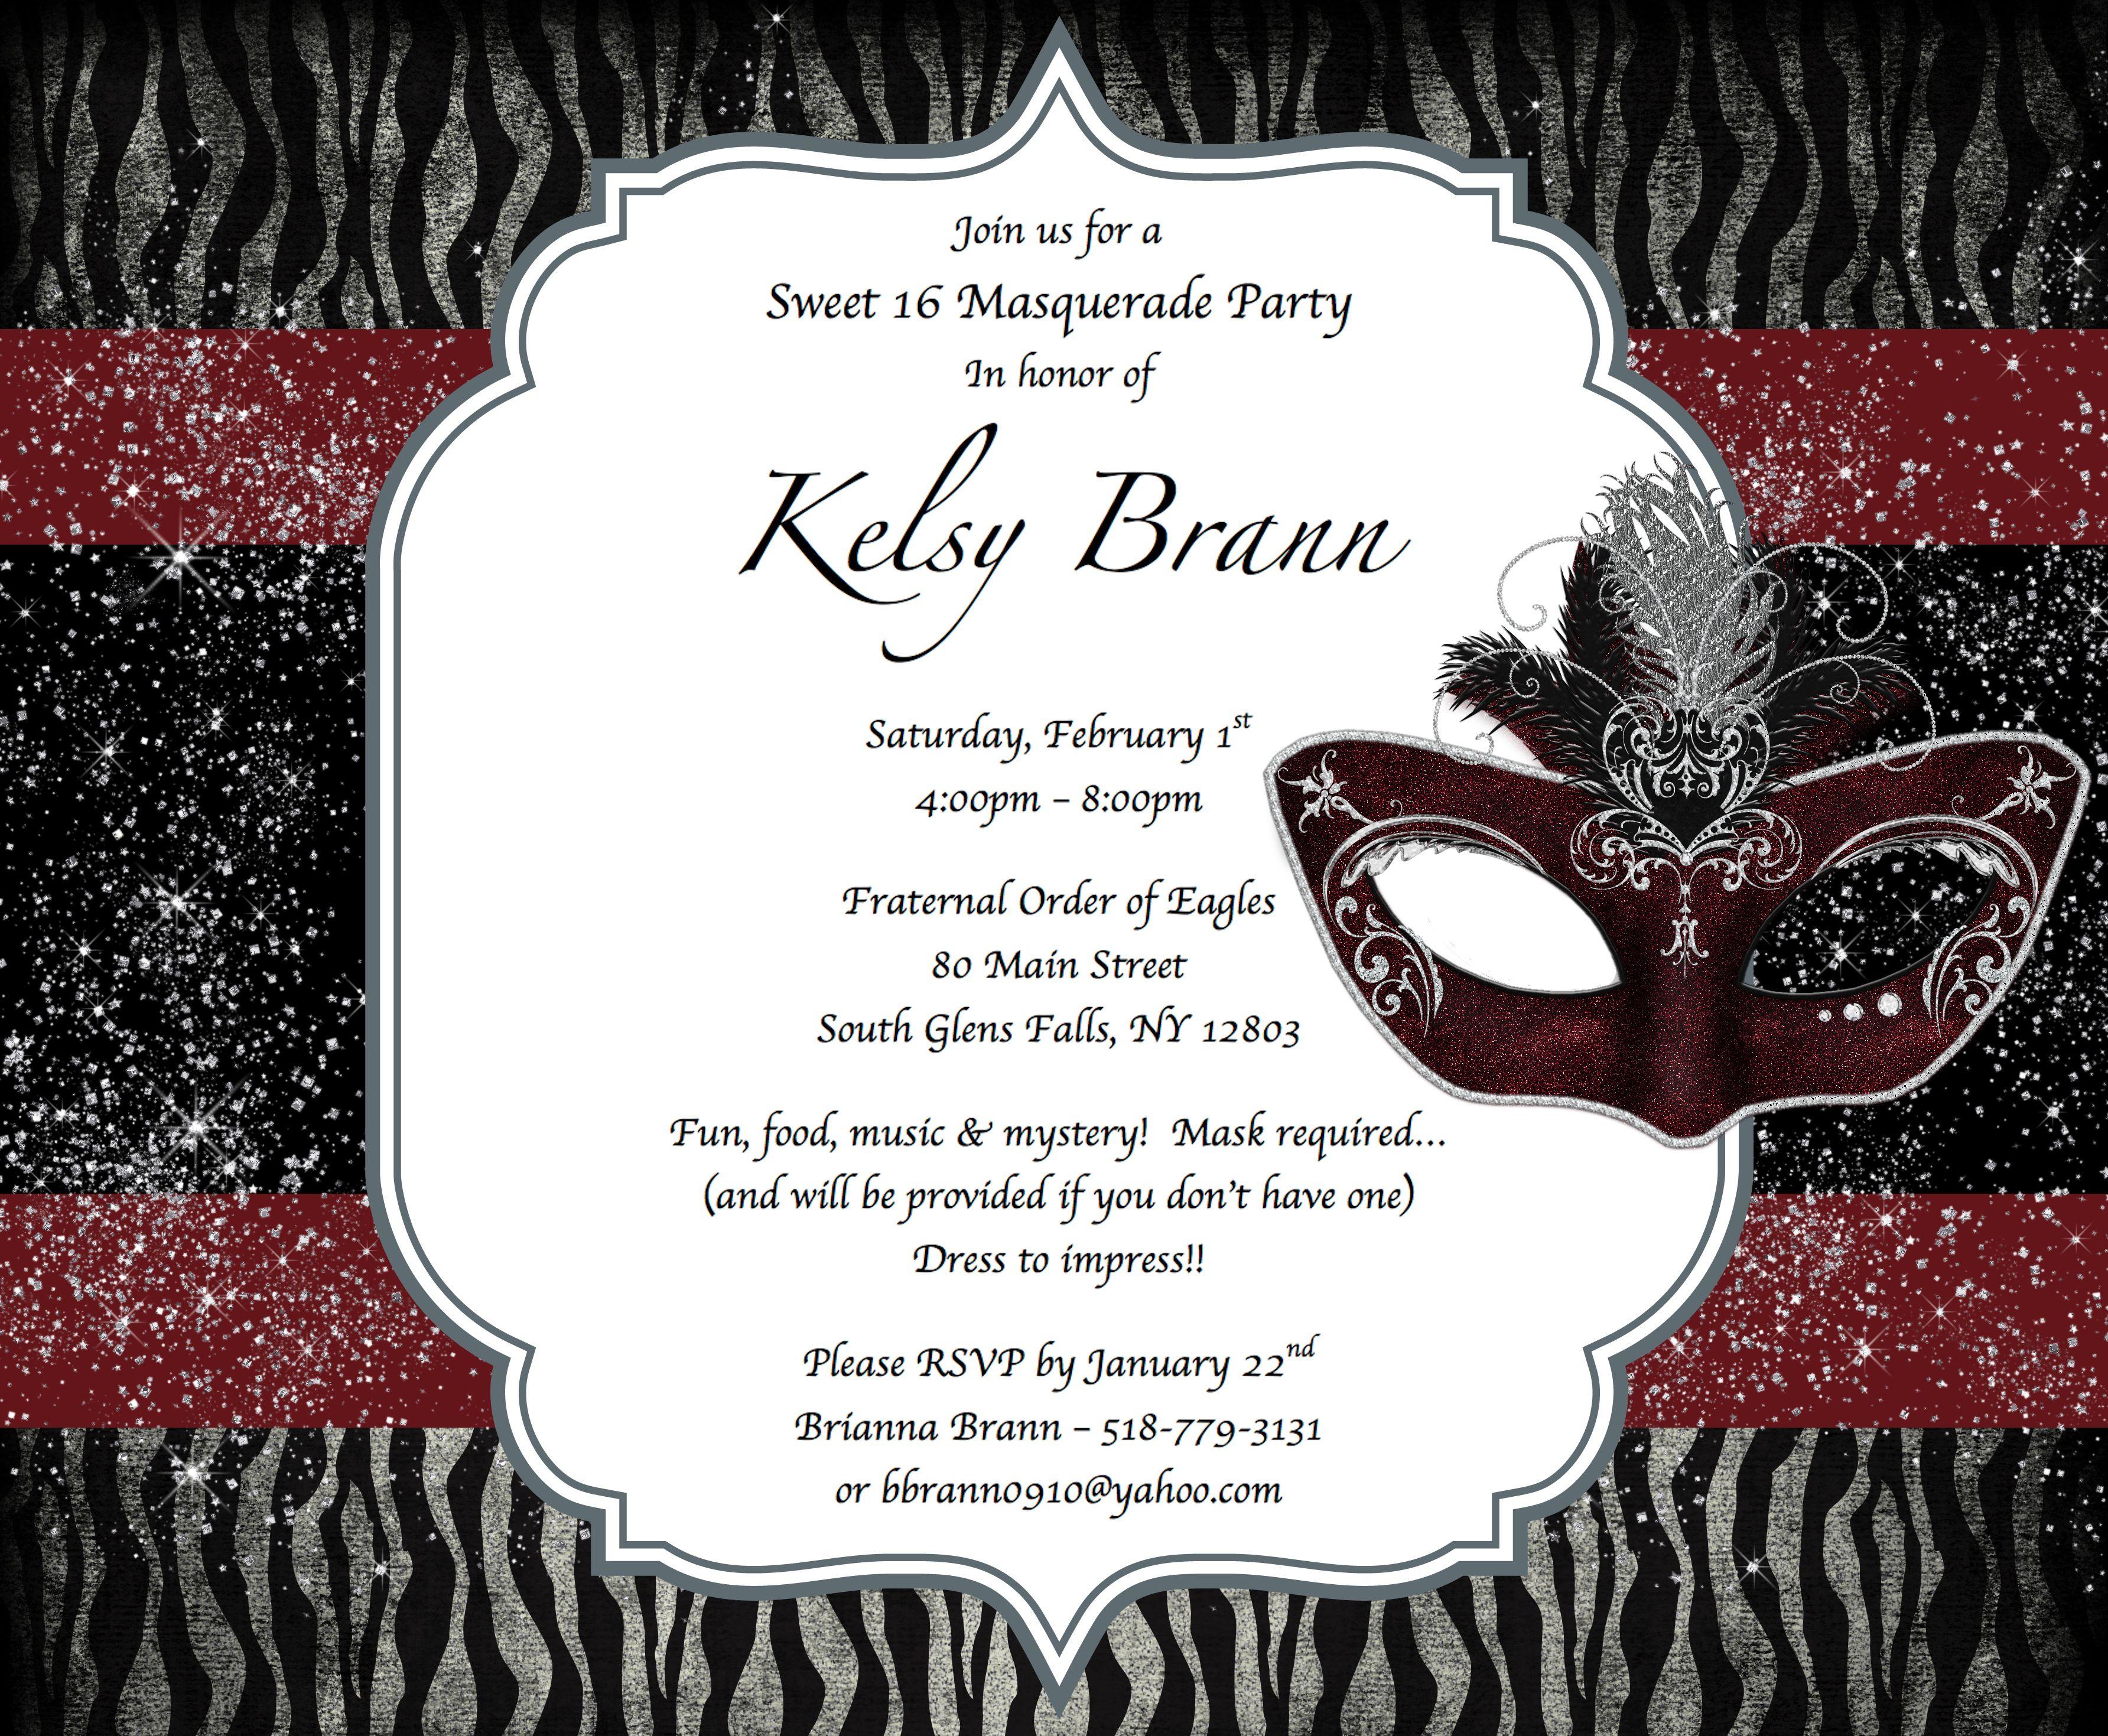 Sweet 16 masquerade party invitations | Kelsy\'s Sweet 16 Masquerade ...